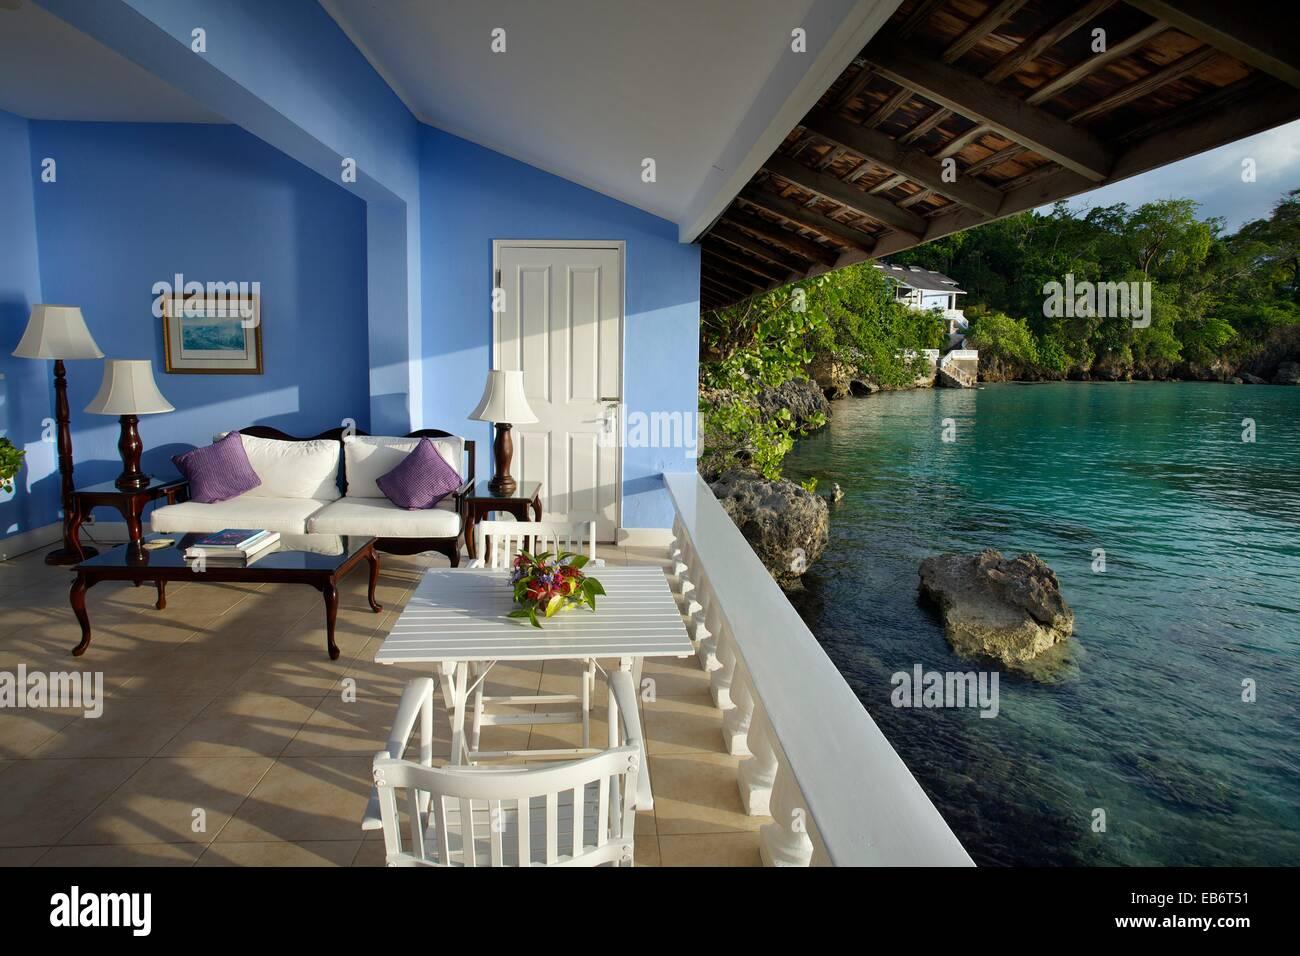 Jamaica Inn Hotel Ocho Rios Jamaica West Indies Caribbean Stock